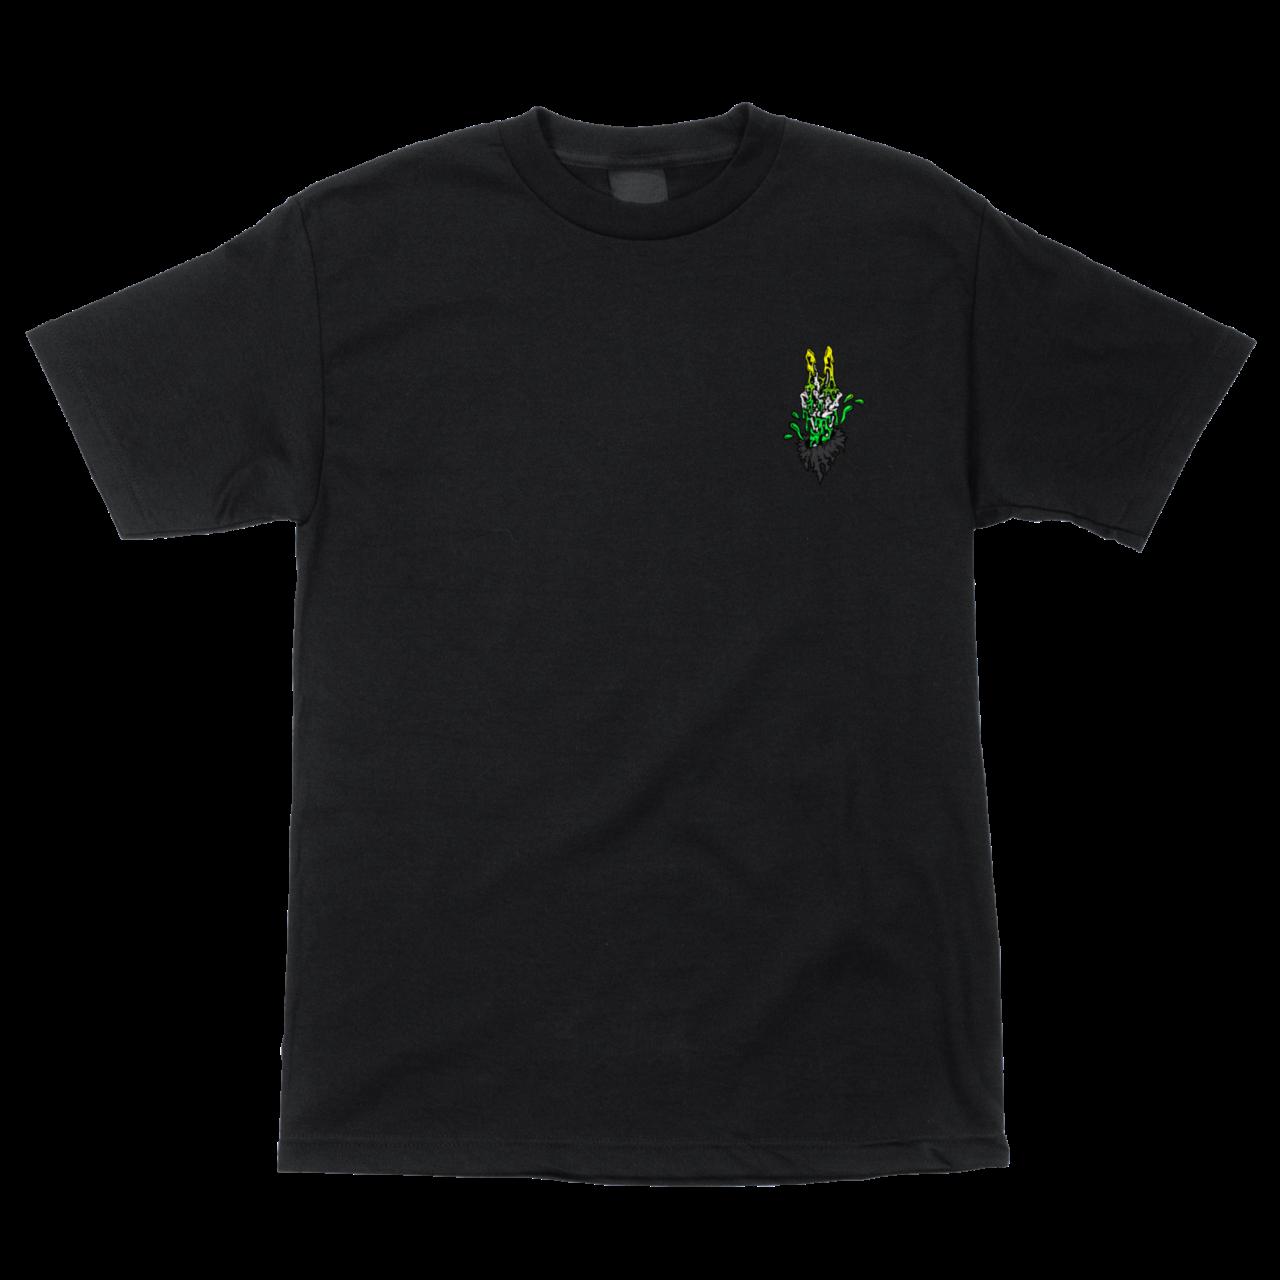 Slime Balls Peace Out s/s t shirt black